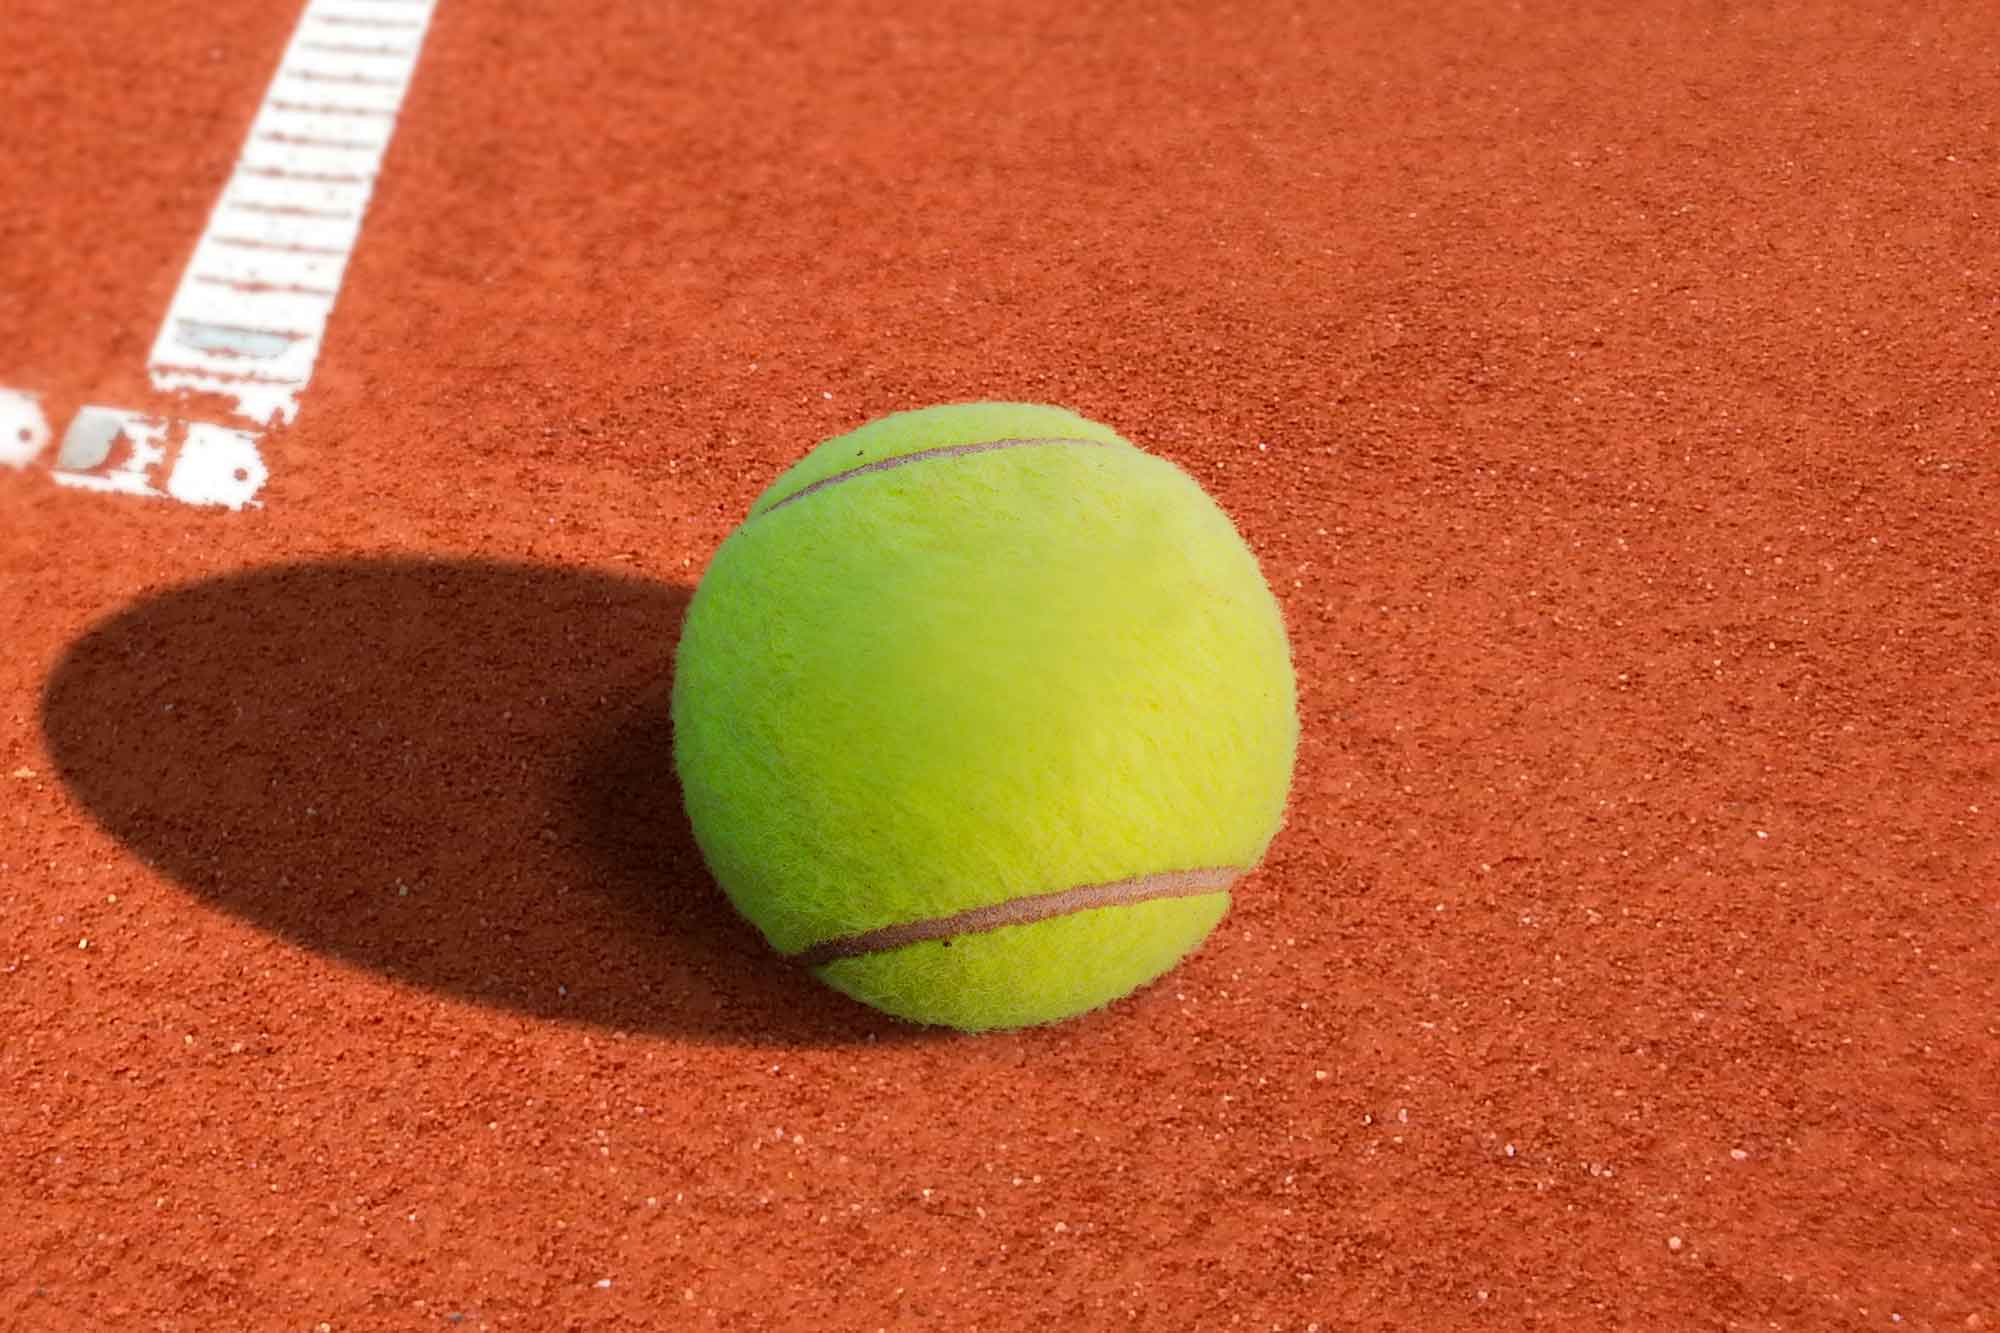 Tennis Ball Mockup 2